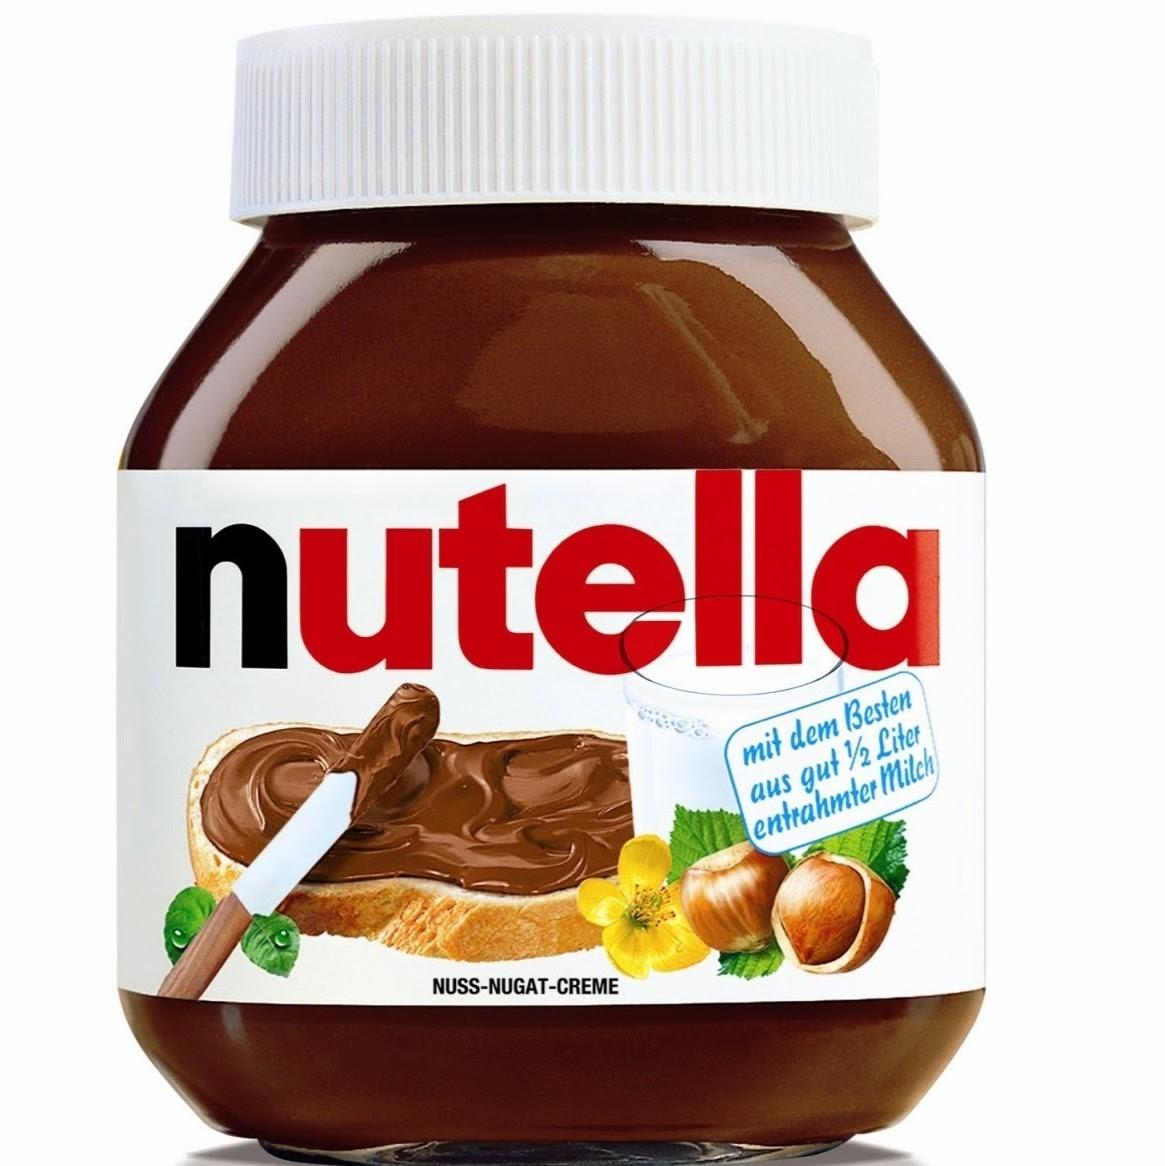 creme nutella pote 650 gramas creme de avel gigante r 42 90 em mercado livre. Black Bedroom Furniture Sets. Home Design Ideas